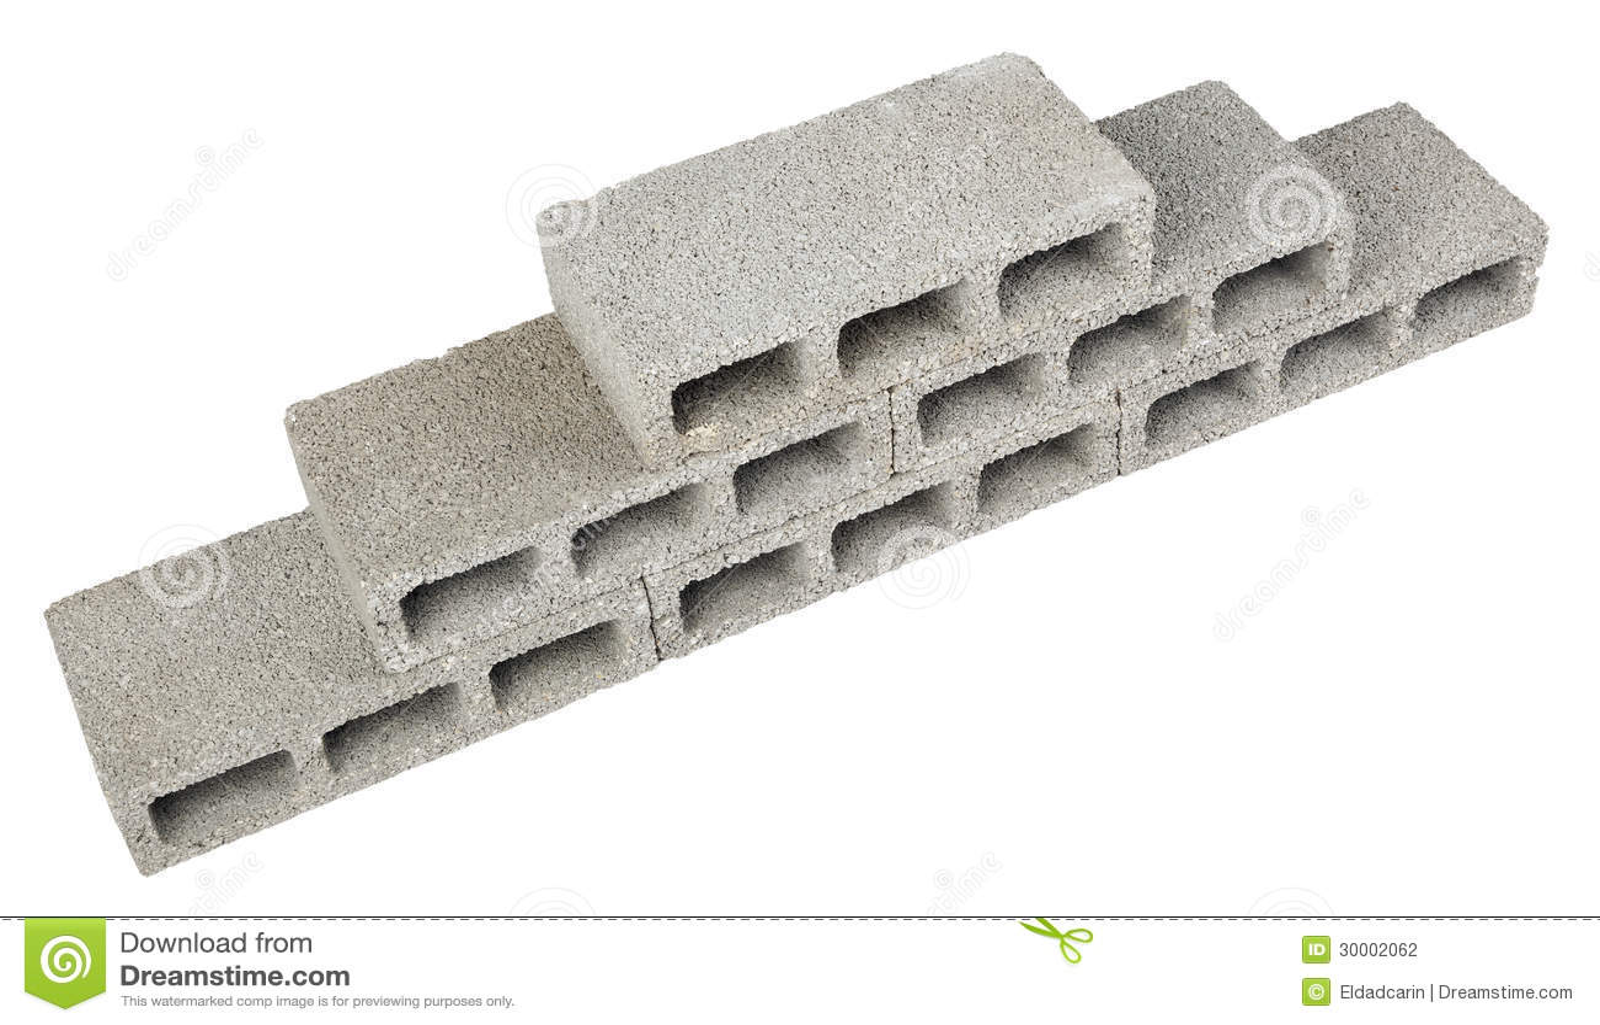 Construction Blocks Pyramid Stock Photo - Image of